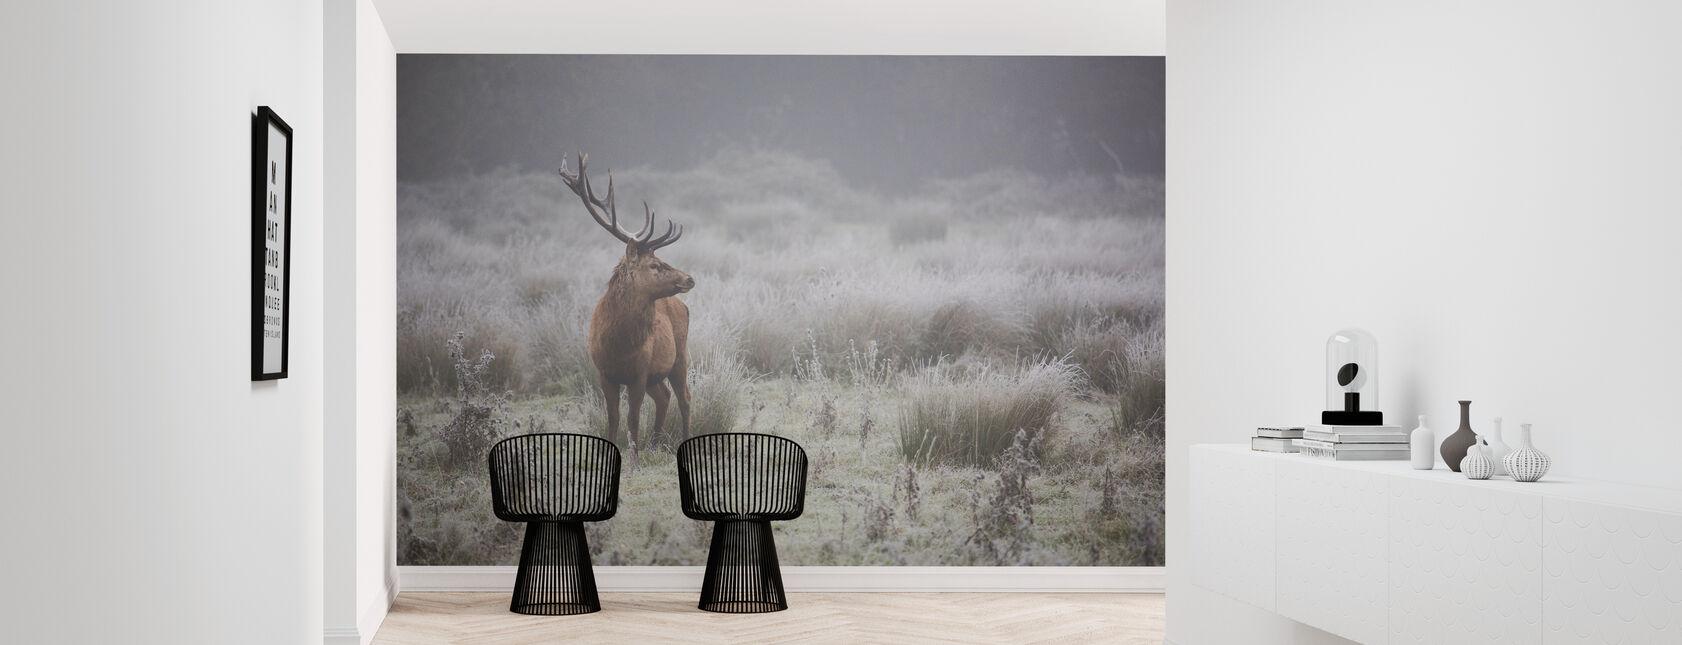 Prideful Deer - Wallpaper - Hallway